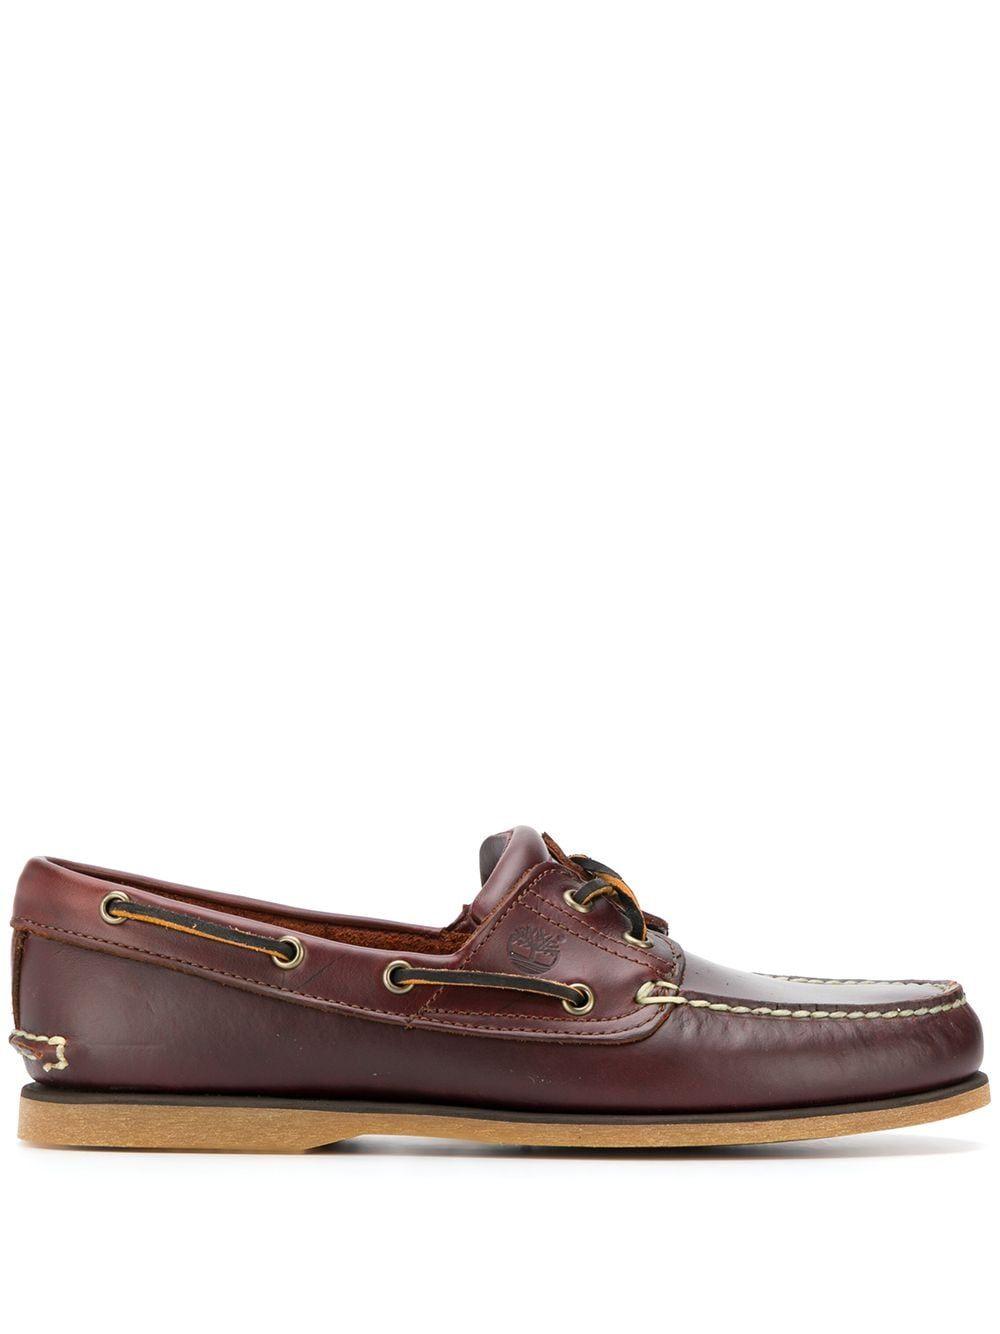 Timberland scarpe basse marrone